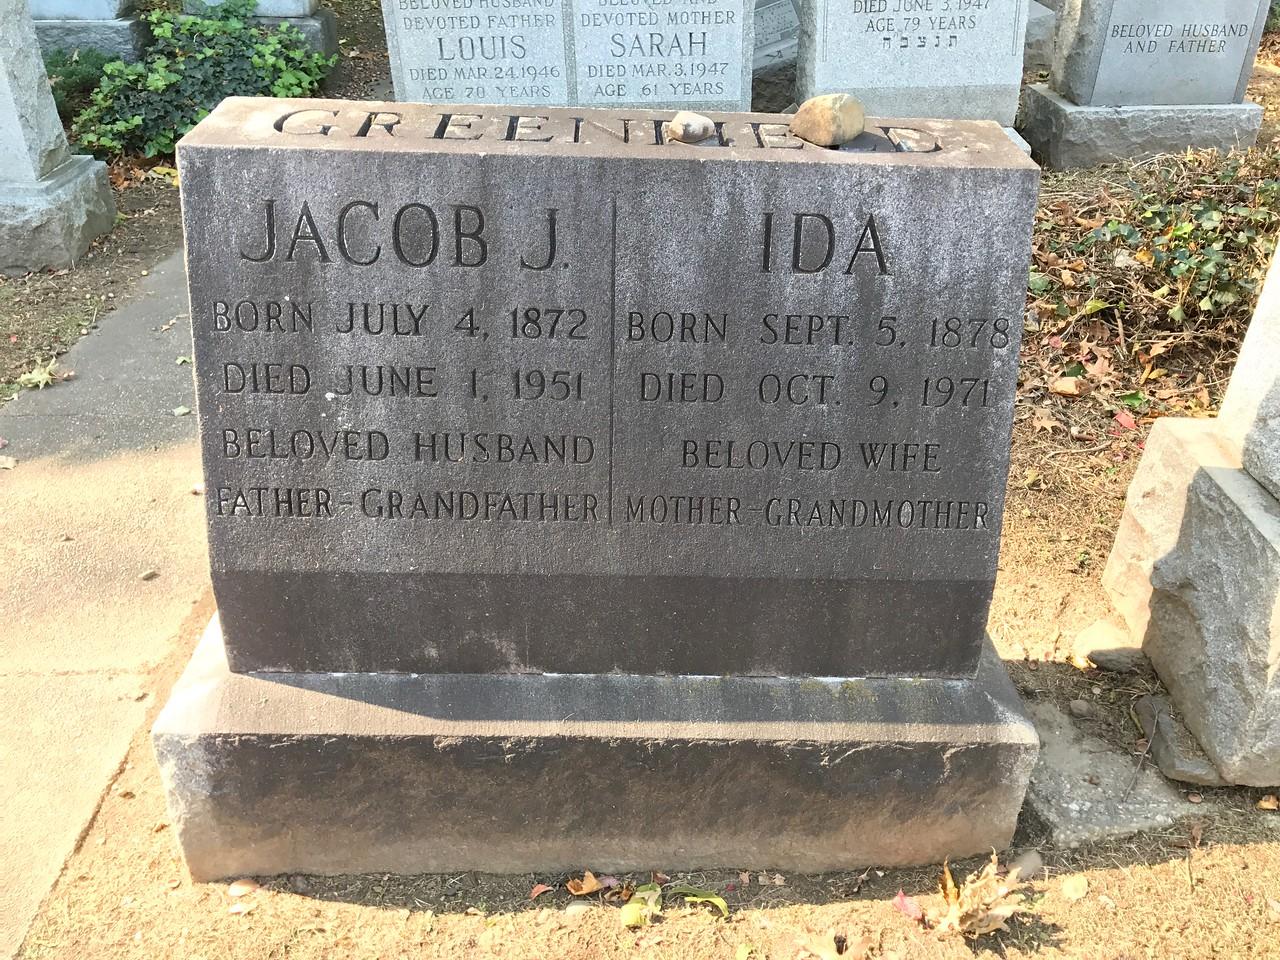 Jacob and Ida Greenfield Tombstone